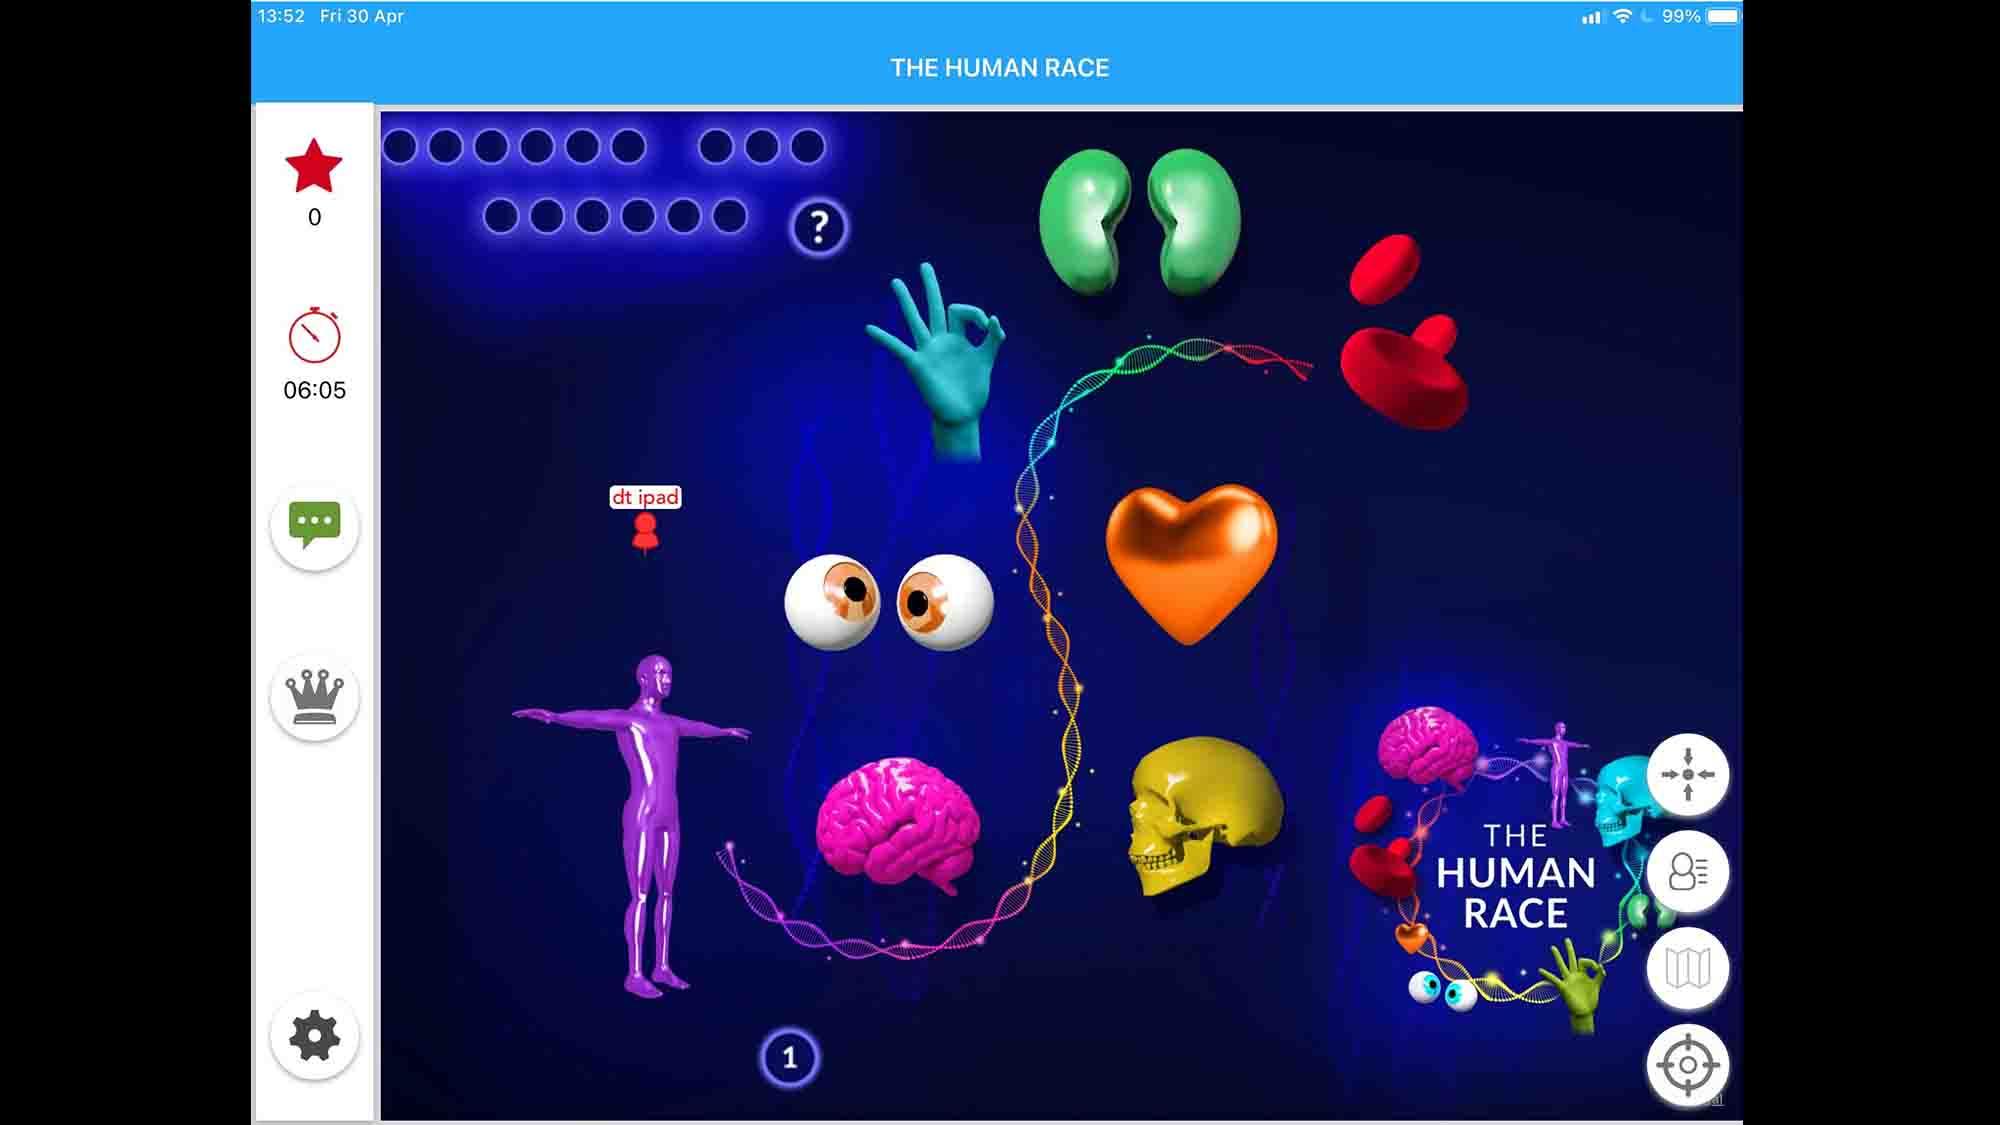 The Human Race Screen